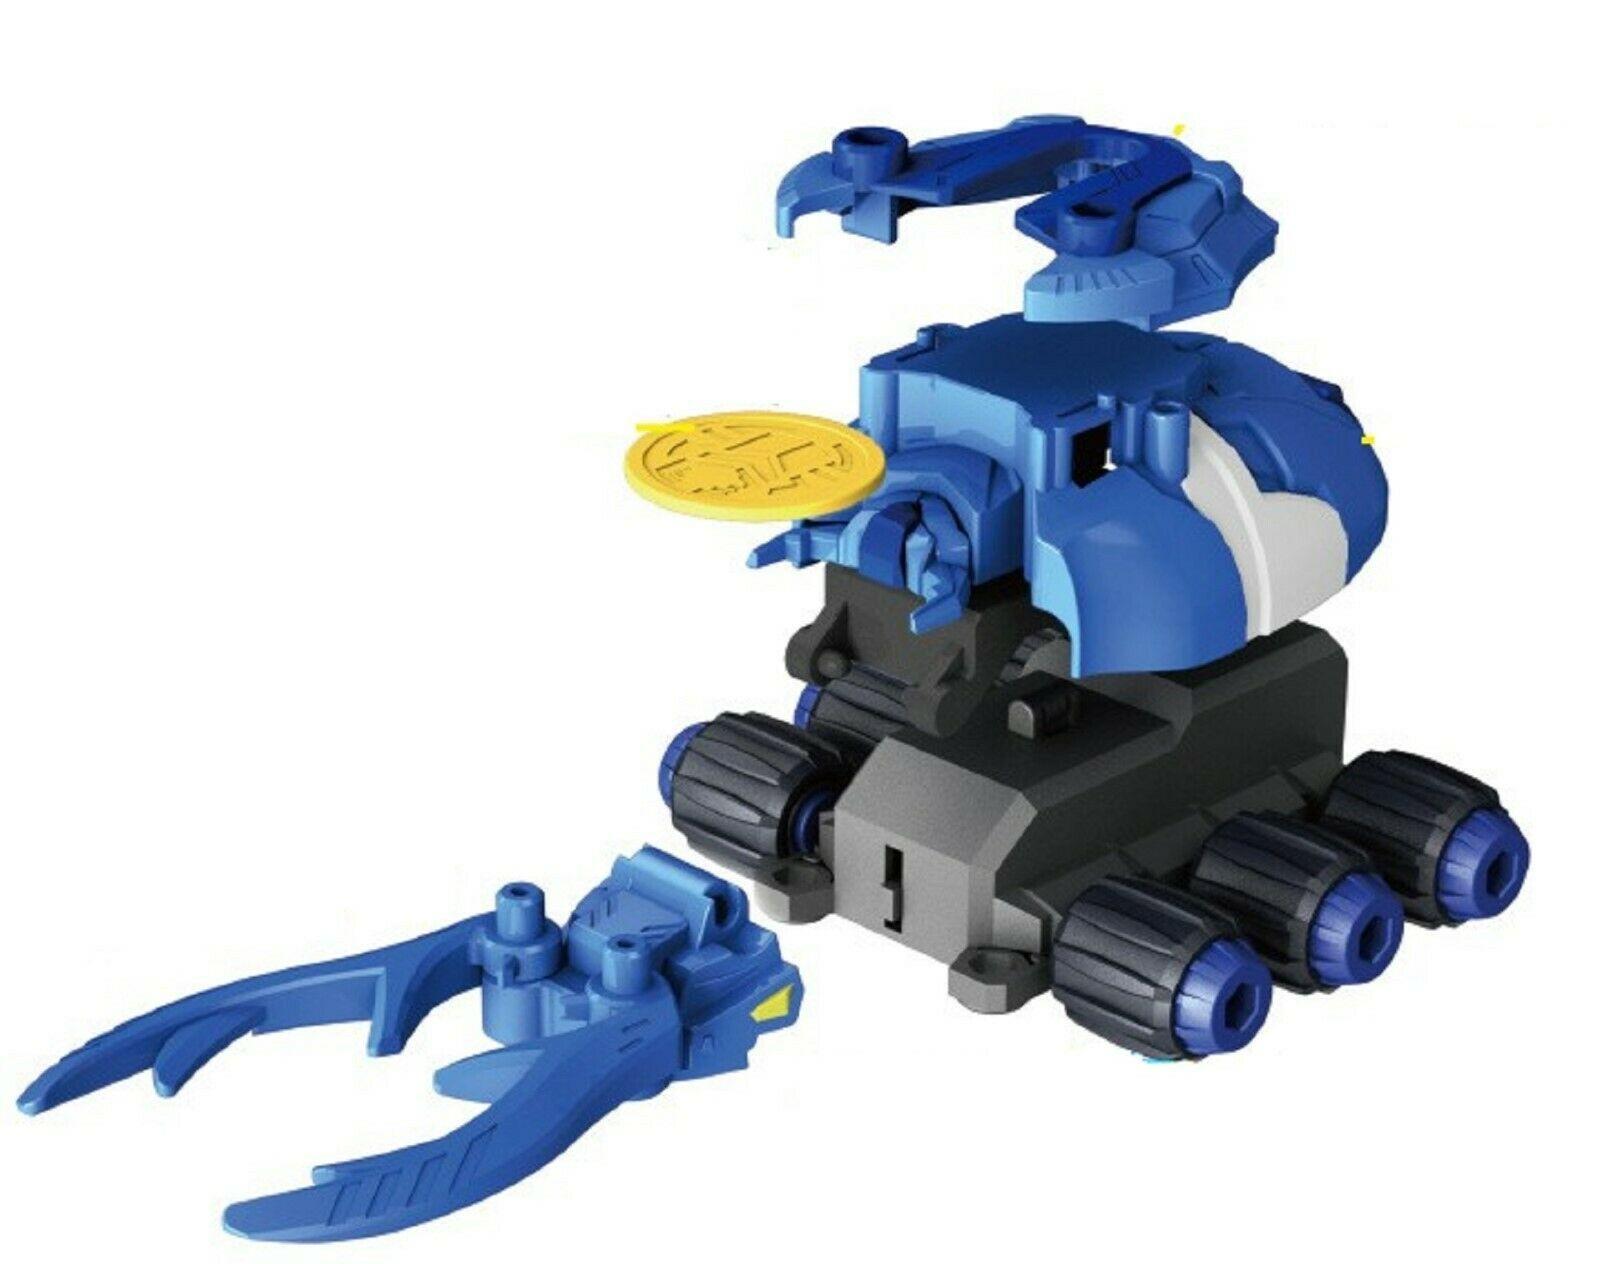 Bugsbot B-02 Ignition Basic Battle Muta Action Figure Battling Bug Toy